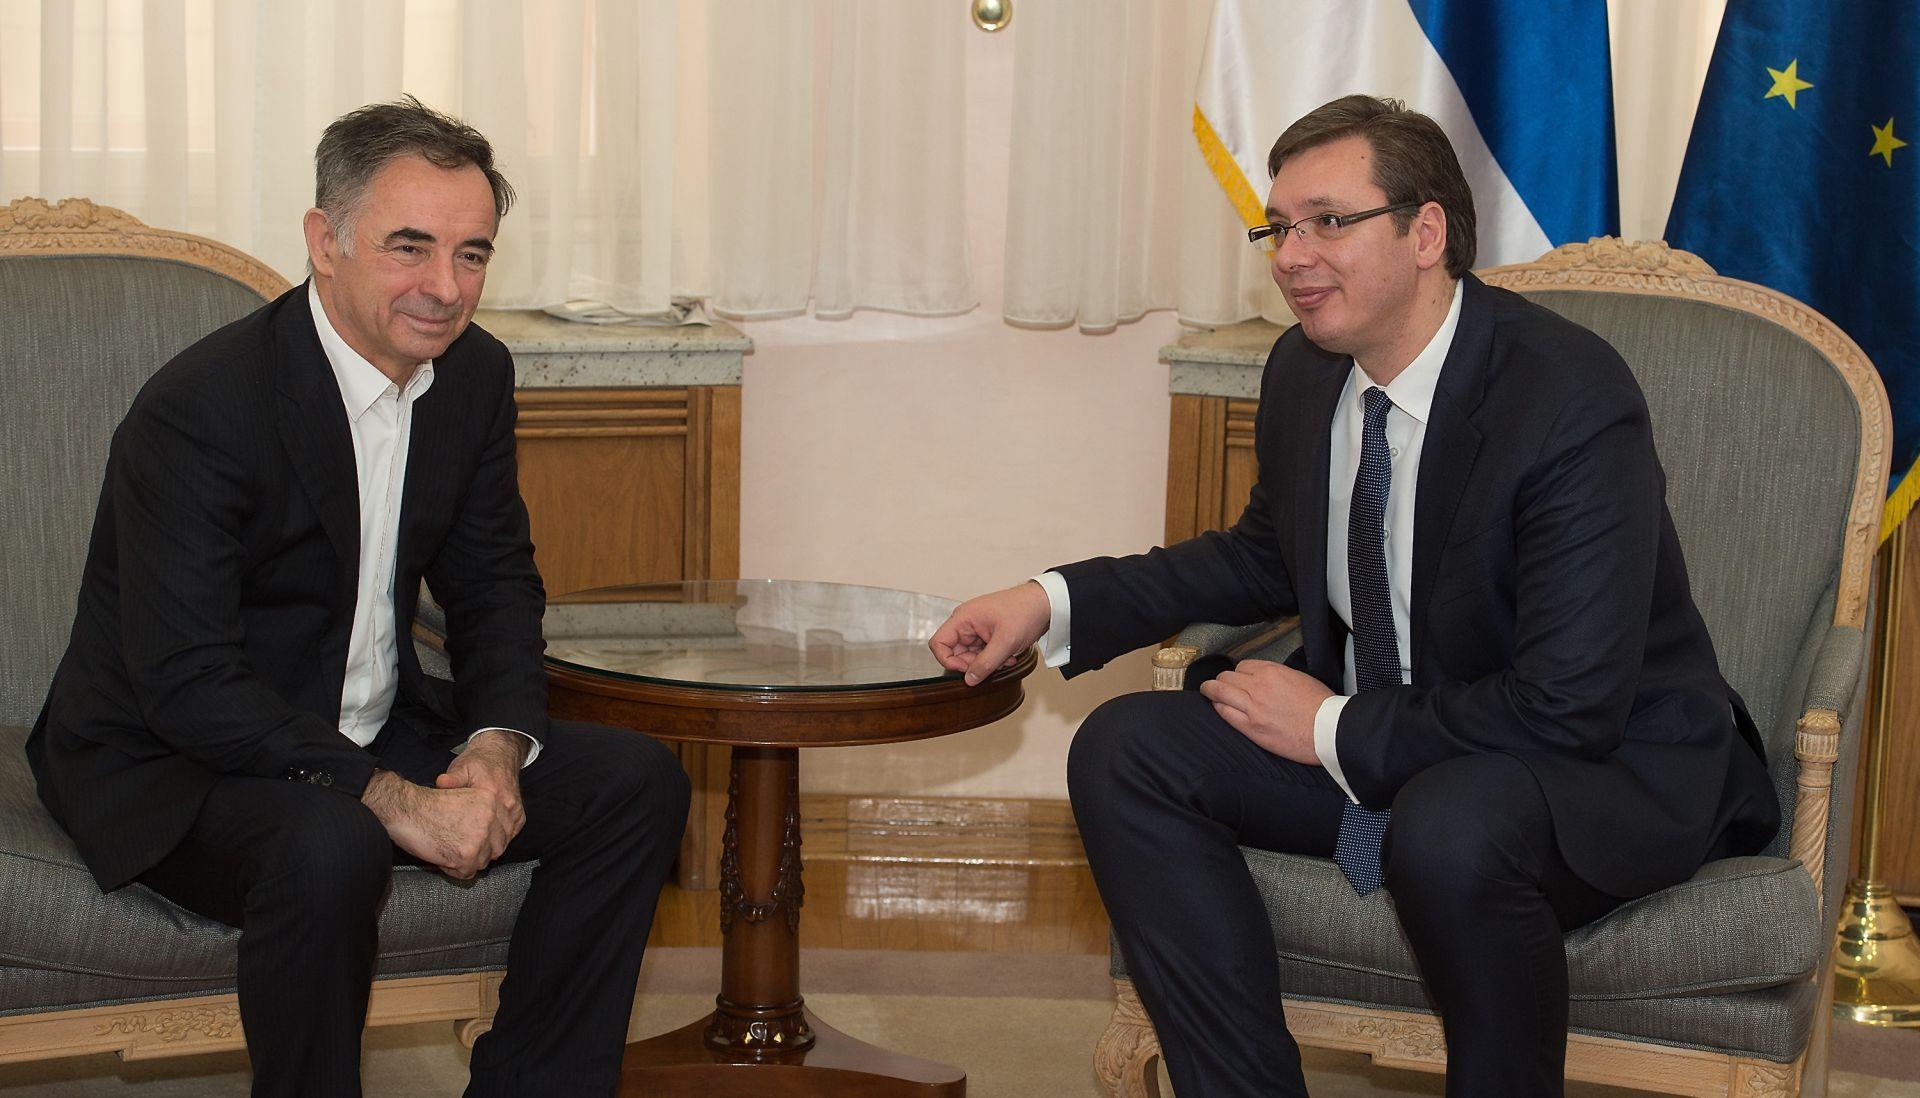 Vučić i Pupovac u Beogradu razgovarali o položaju Srba u Hrvatskoj